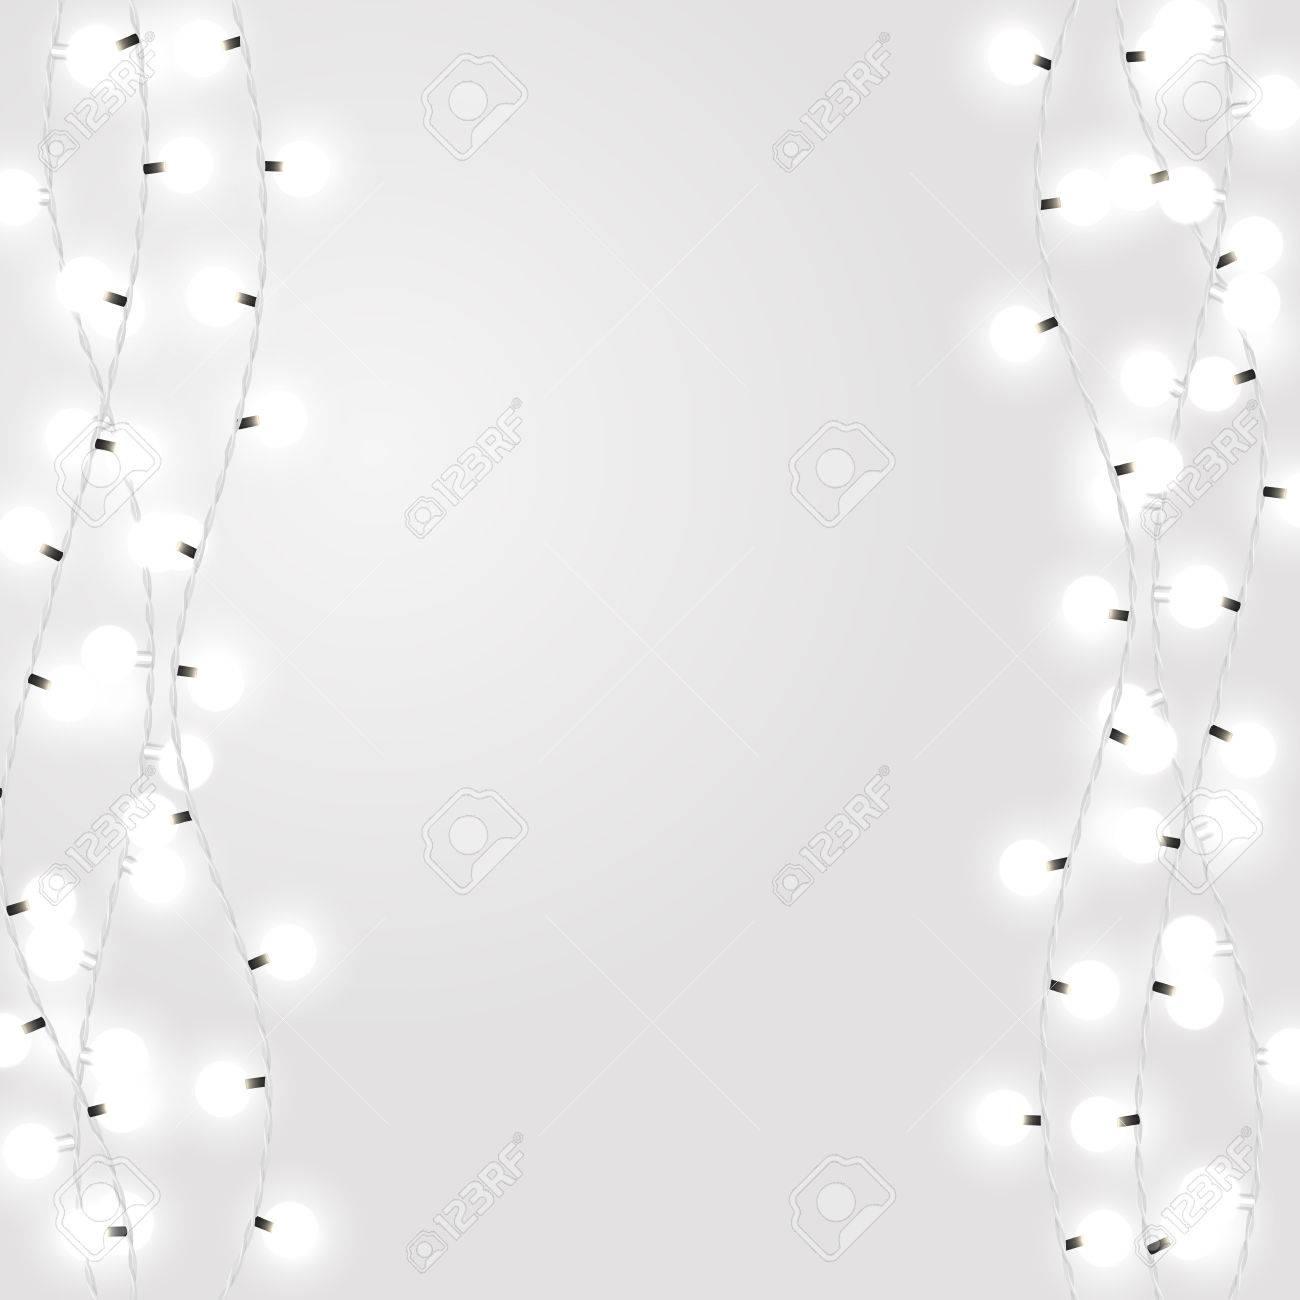 Weihnachtsbeleuchtung Glühlampen.Stock Photo